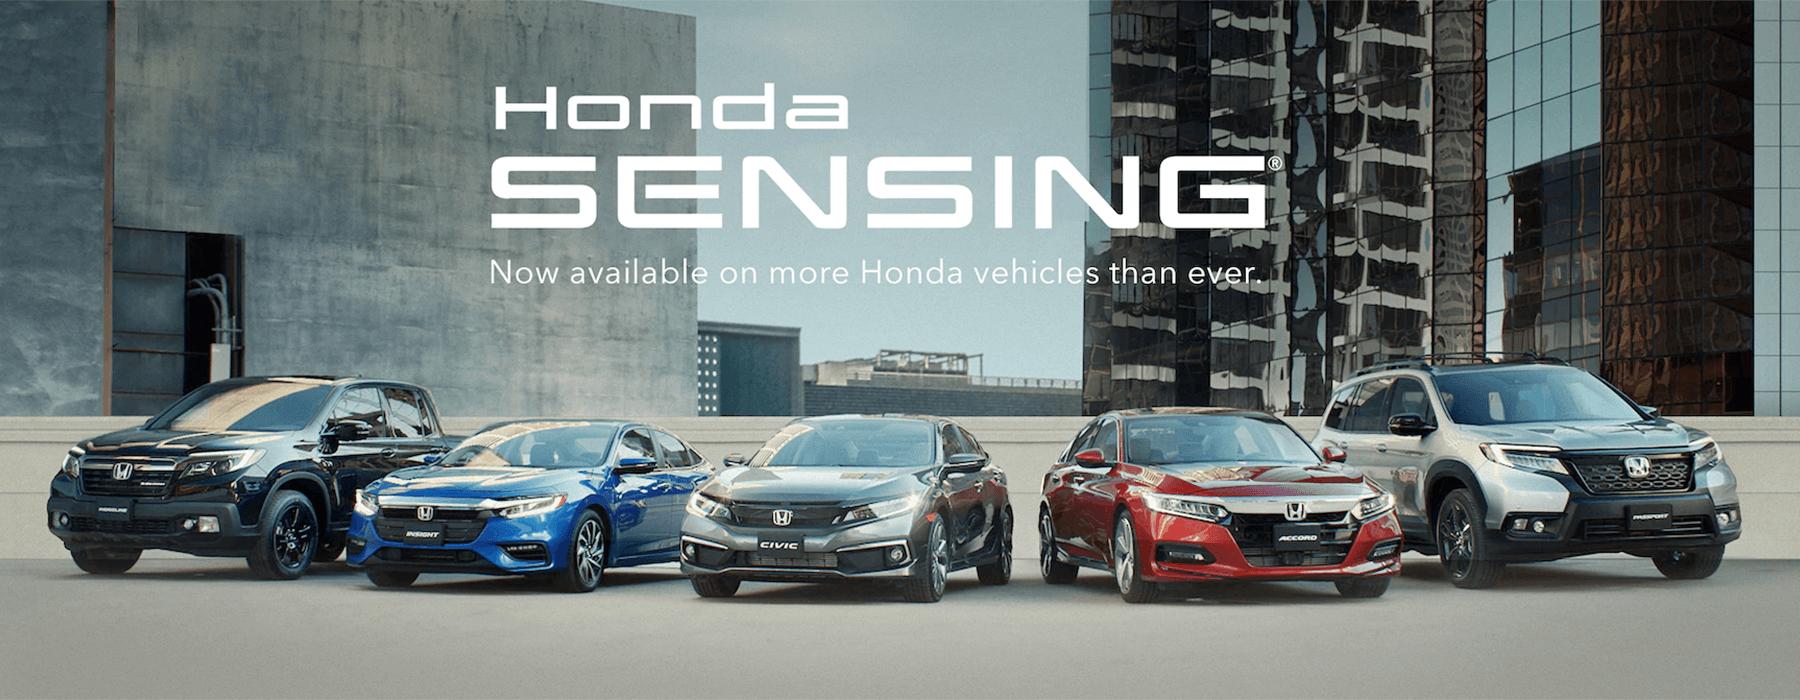 Honda Sensing Vern Eide Honda in Sioux Falls Slider